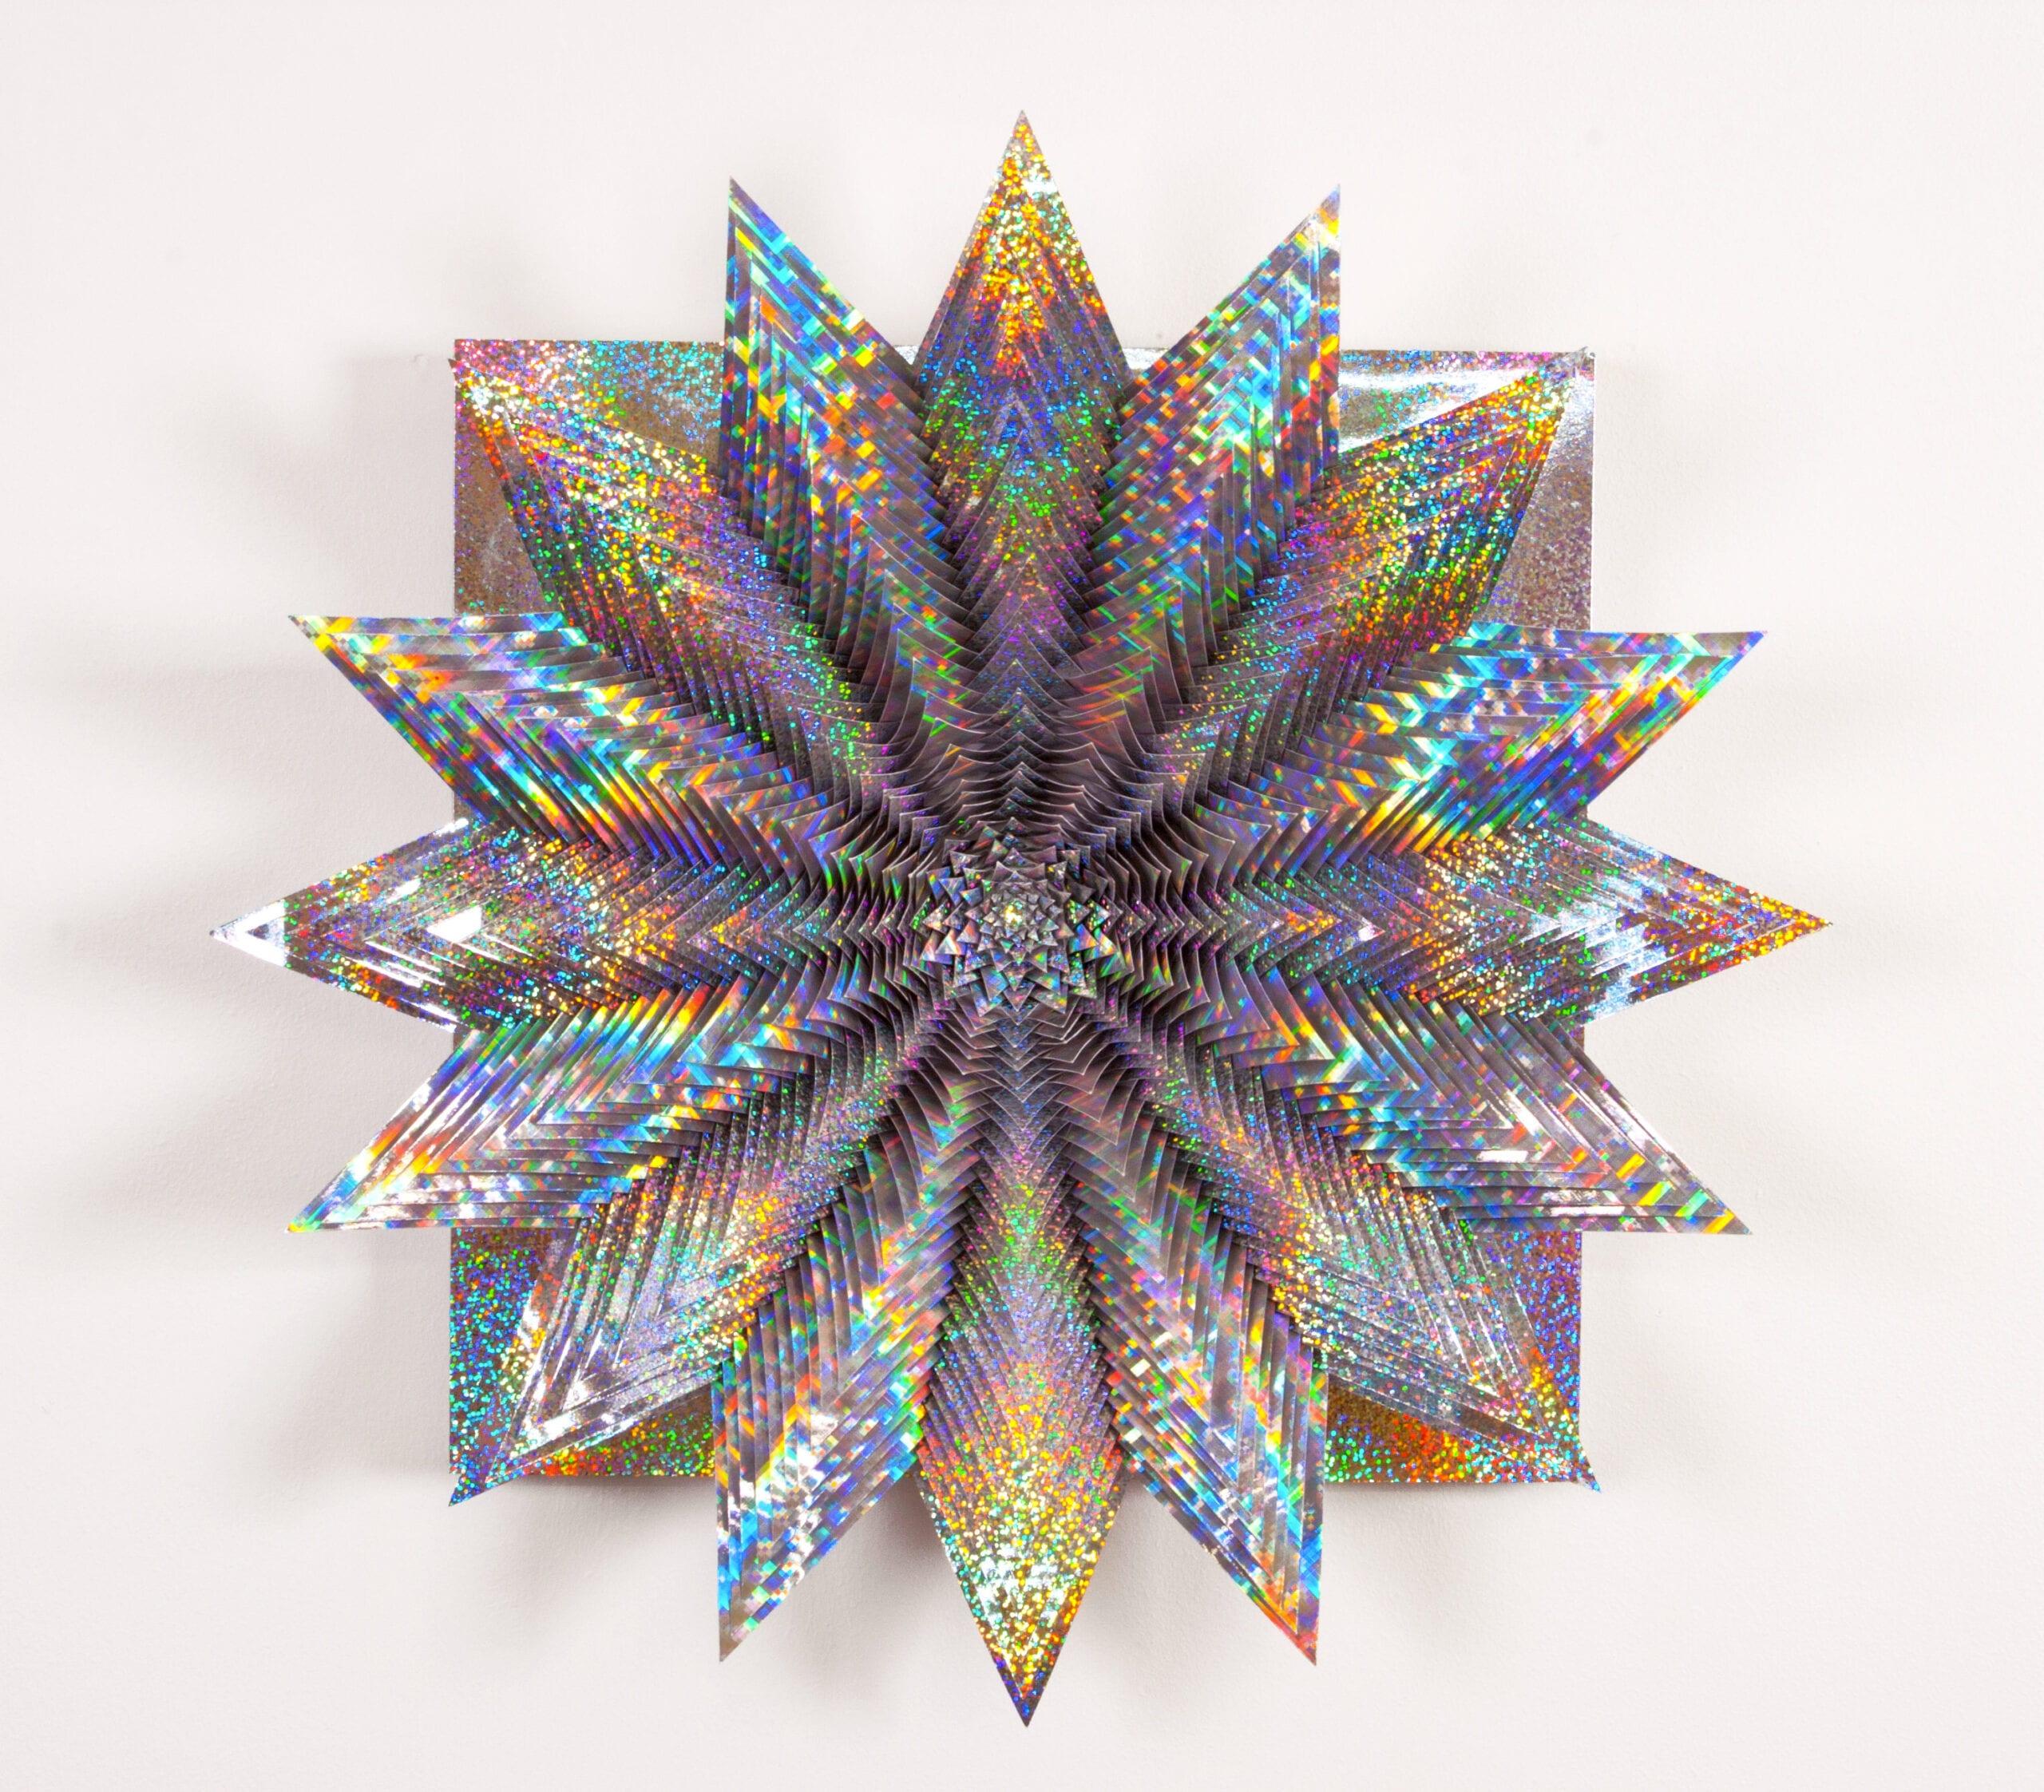 "Jen Stark, Holographic Spectrum, Holographic paper, wood, glue, acrylic paint, 15""x 15""x 4"", 2013."